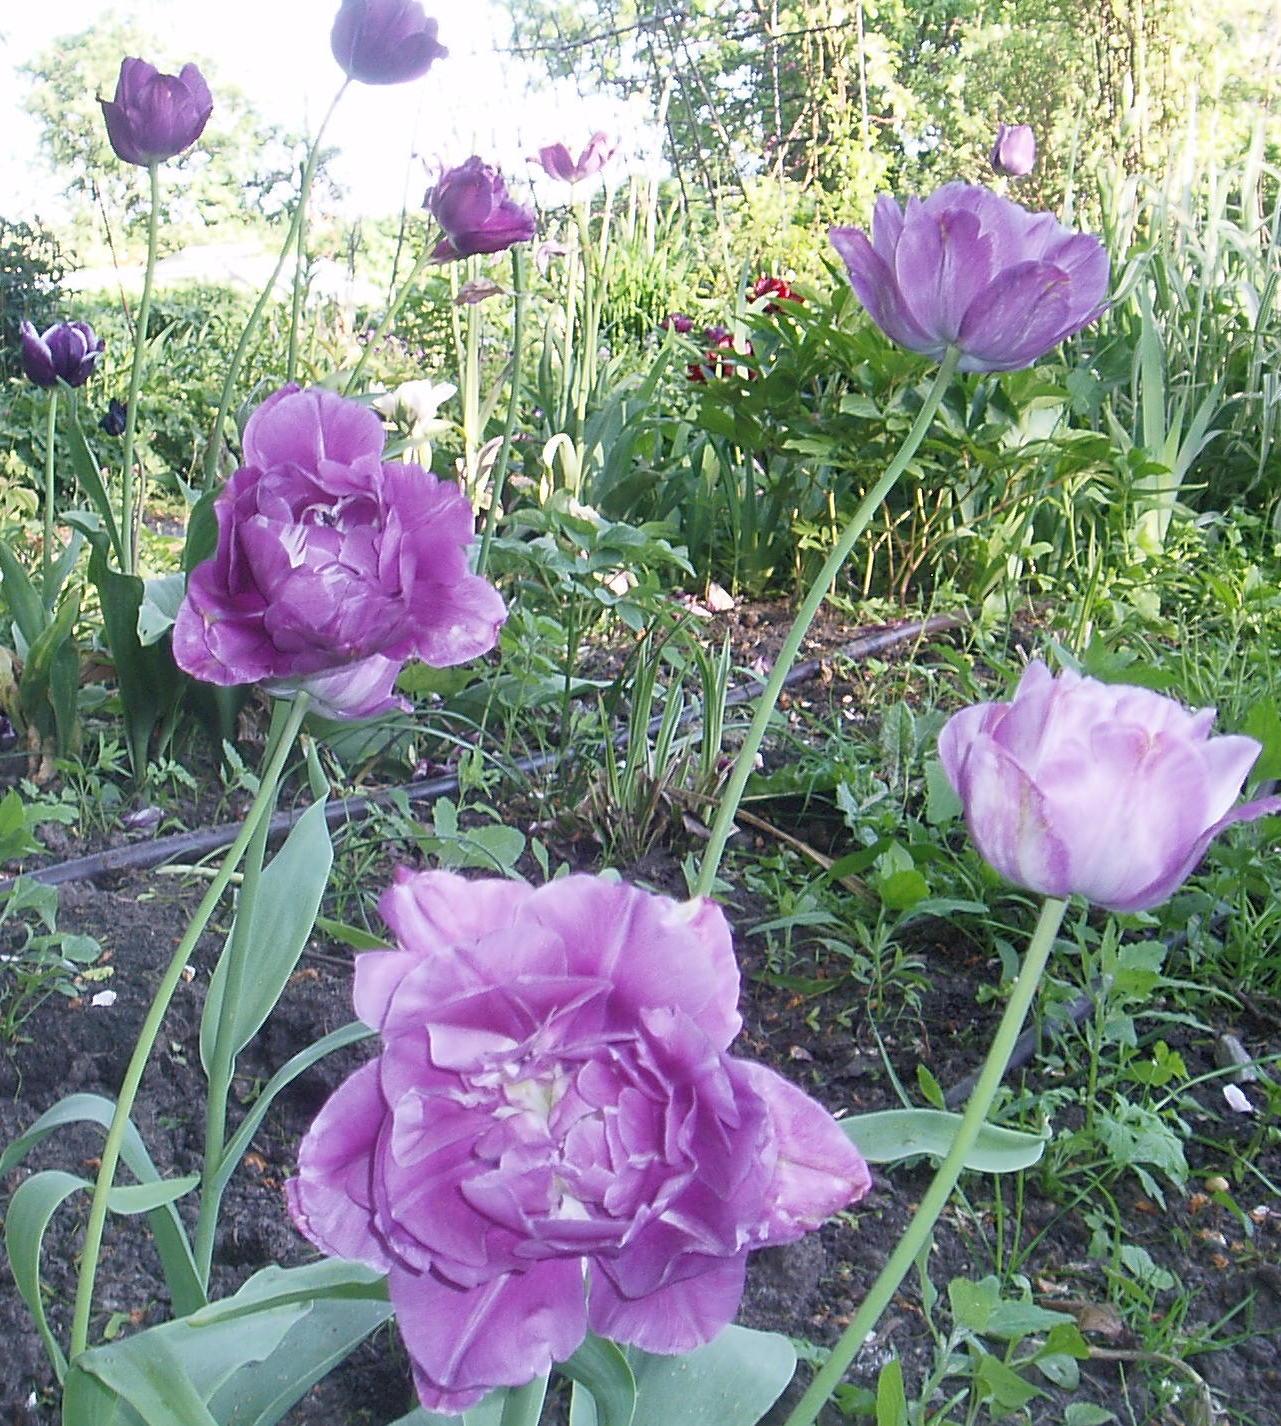 Mariehem i skåne: tulipa 'blue wow' och takbyte, del 2.